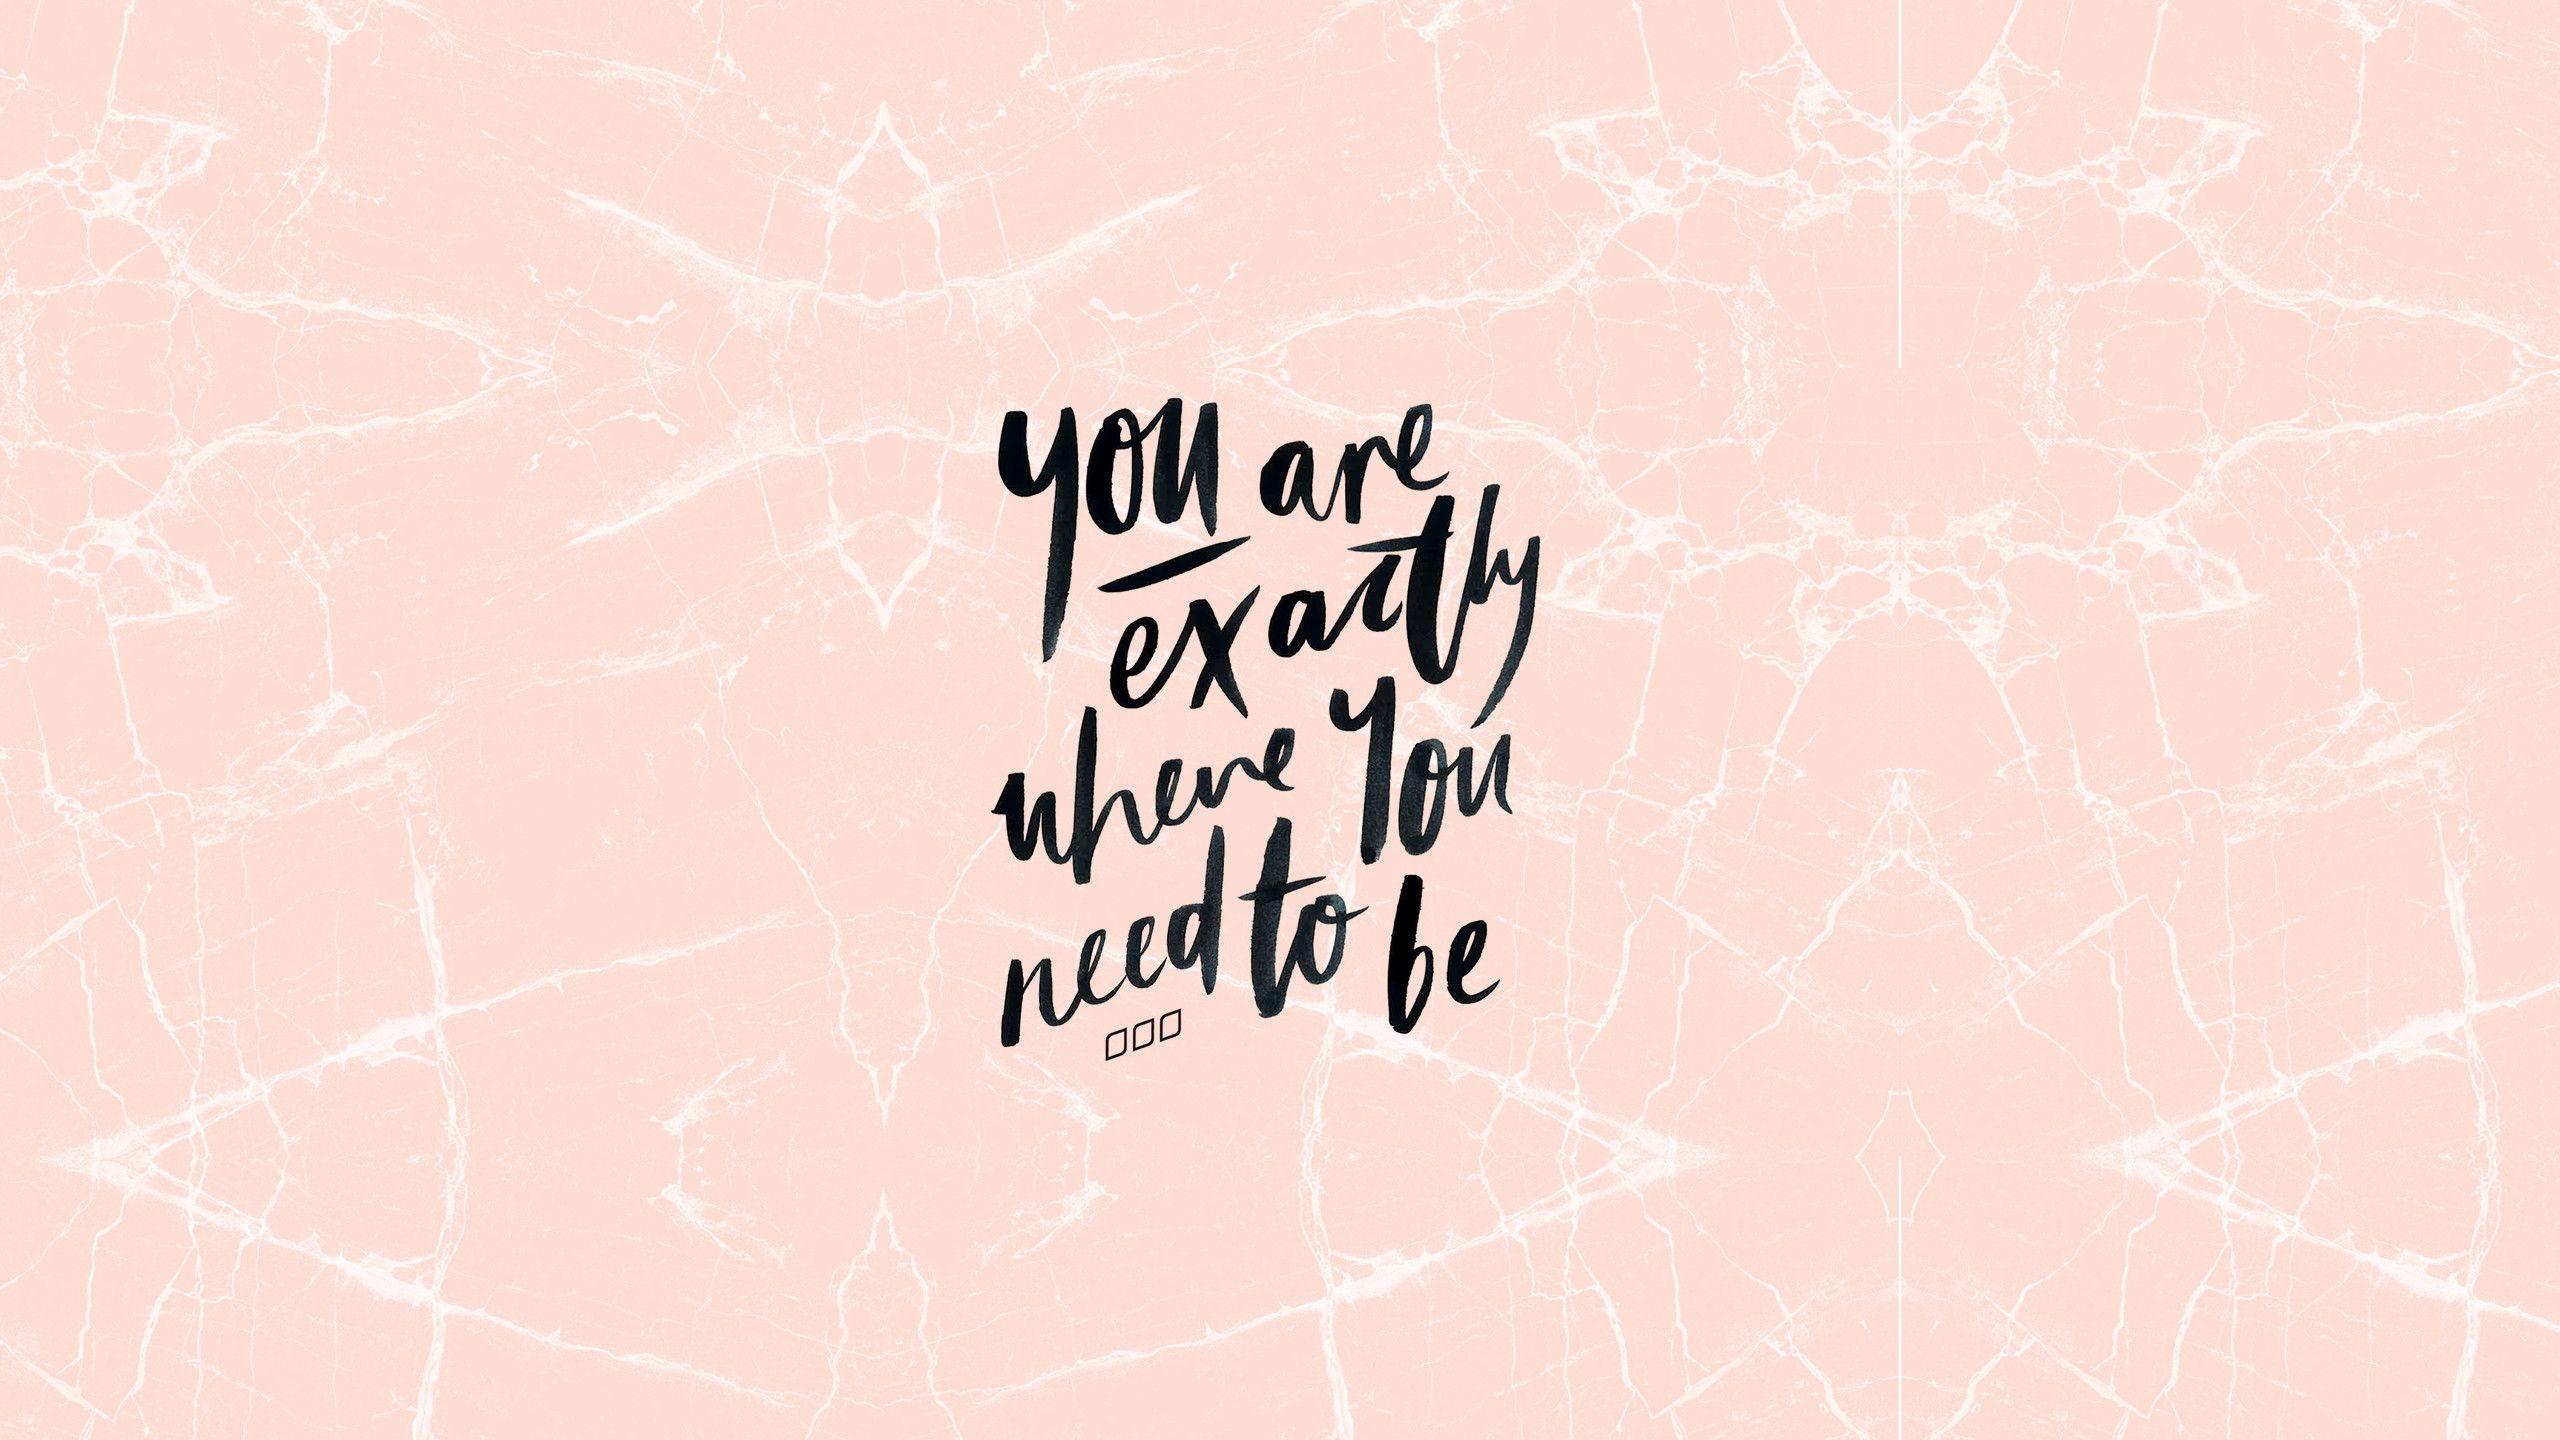 Positive Thinking Motivational Quotes Desktop Wallpaper Hd